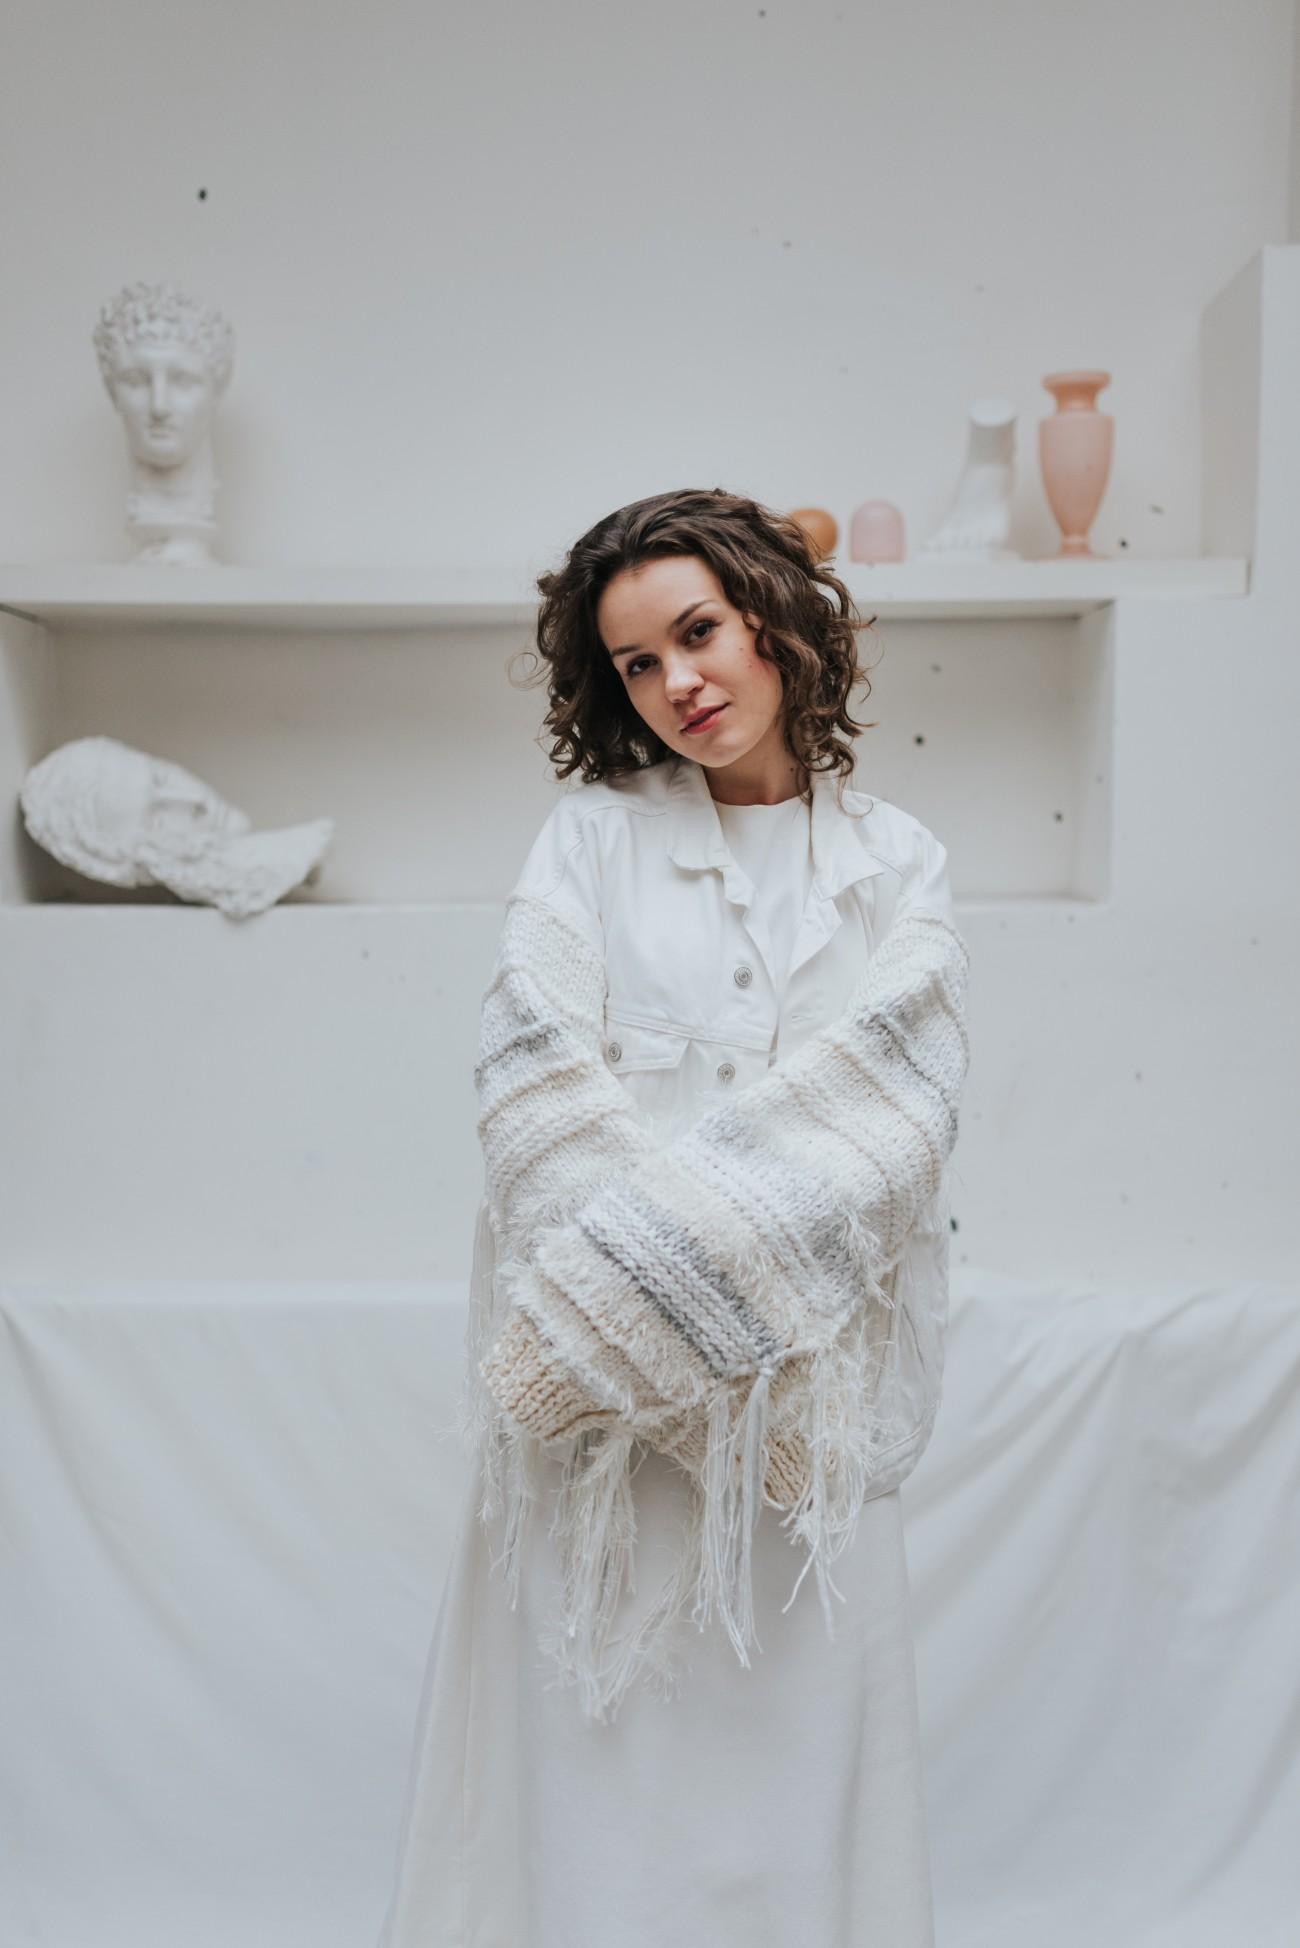 Bílá svatební denim bunda - Tvorbou - foto Katerina Kasparova (7 of 7)